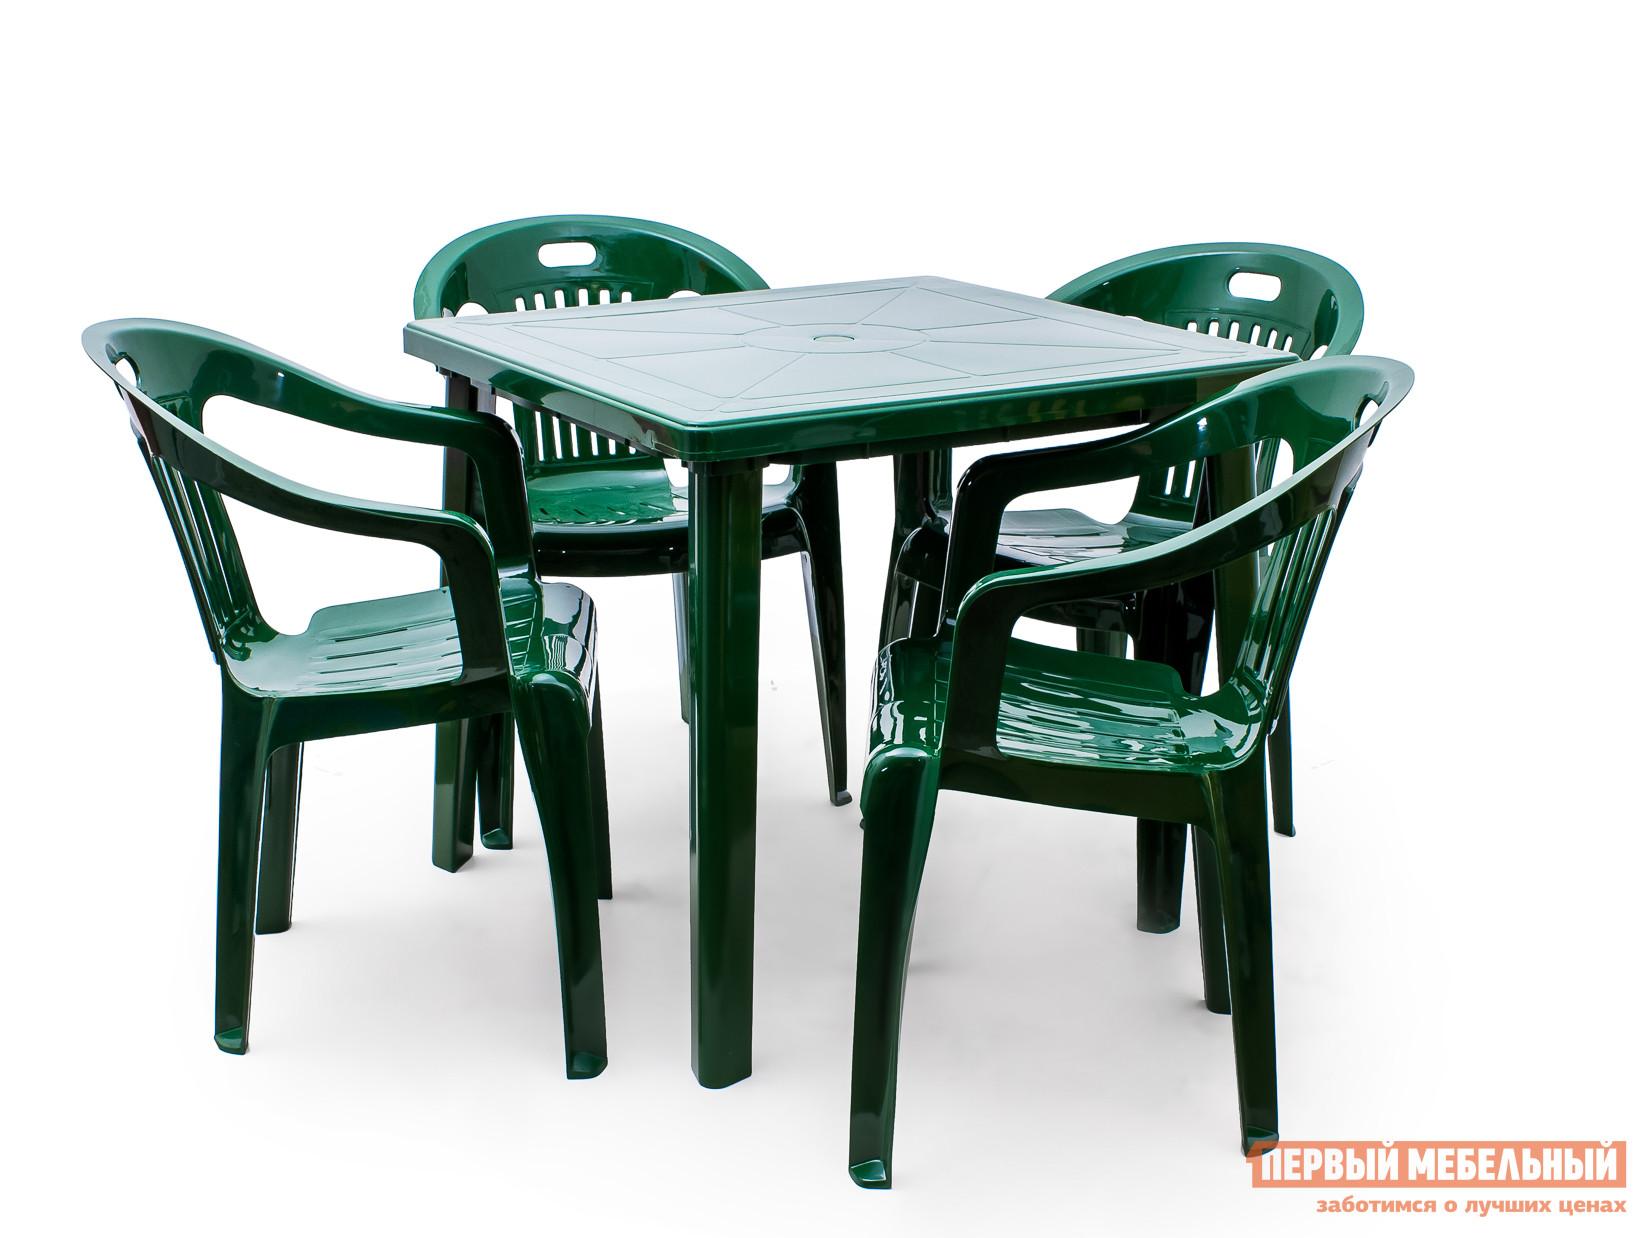 "Набор пластиковой мебели Стандарт Пластик Стол квадратный (800х800х710) + Кресло №5 ""Комфорт-1"" (540x535x780мм), 4 шт. Темно-зеленый"